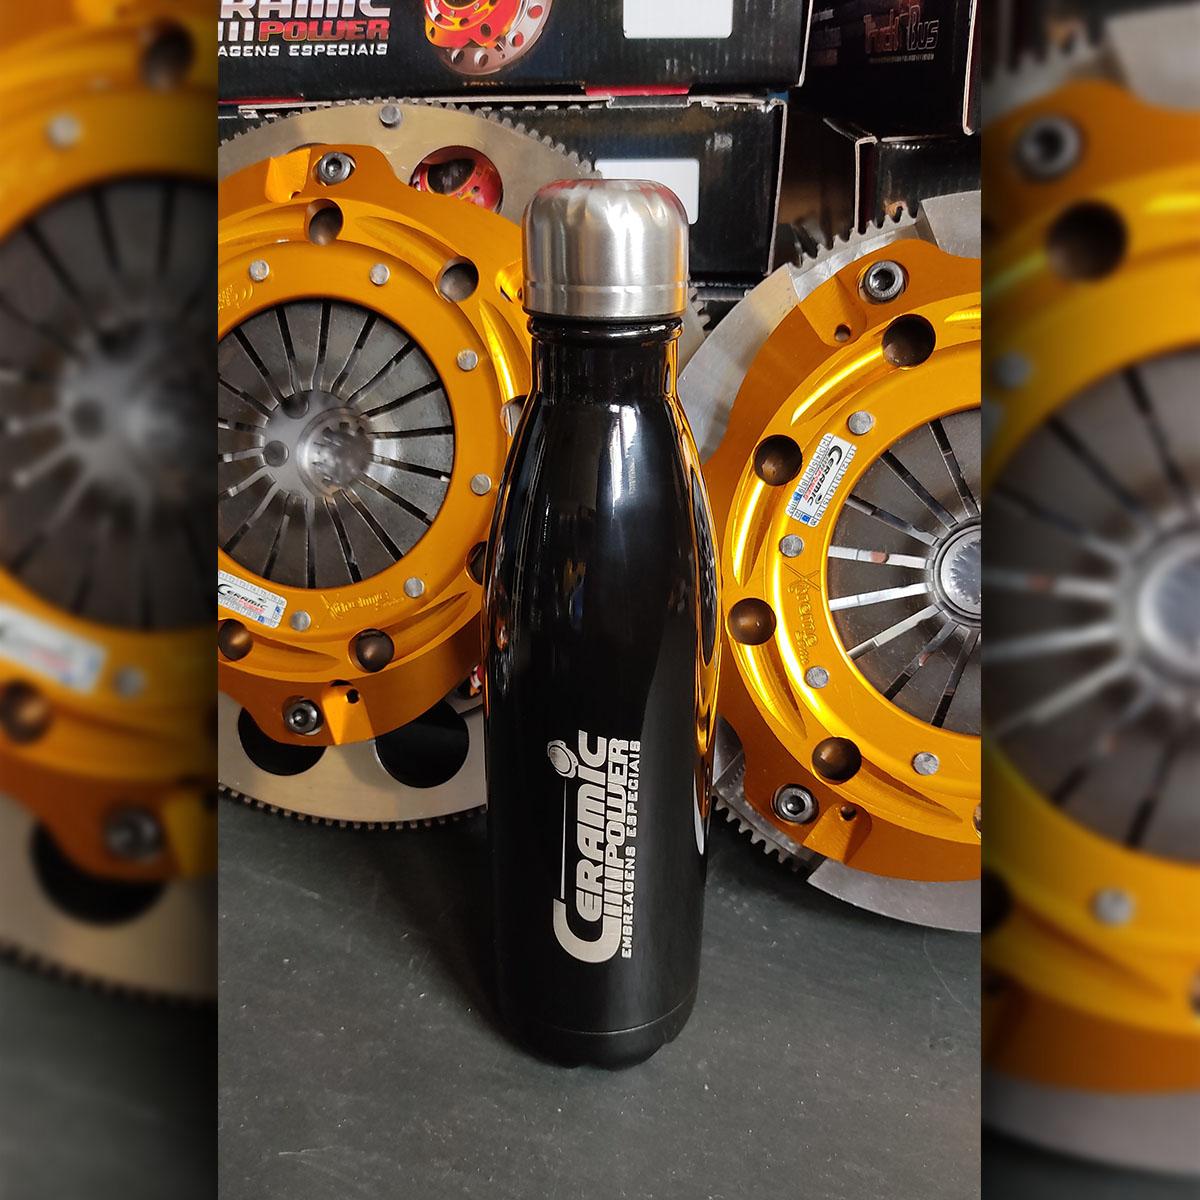 Garrafa Squeeze Aço Inox Preta Ceramic Power 750ml